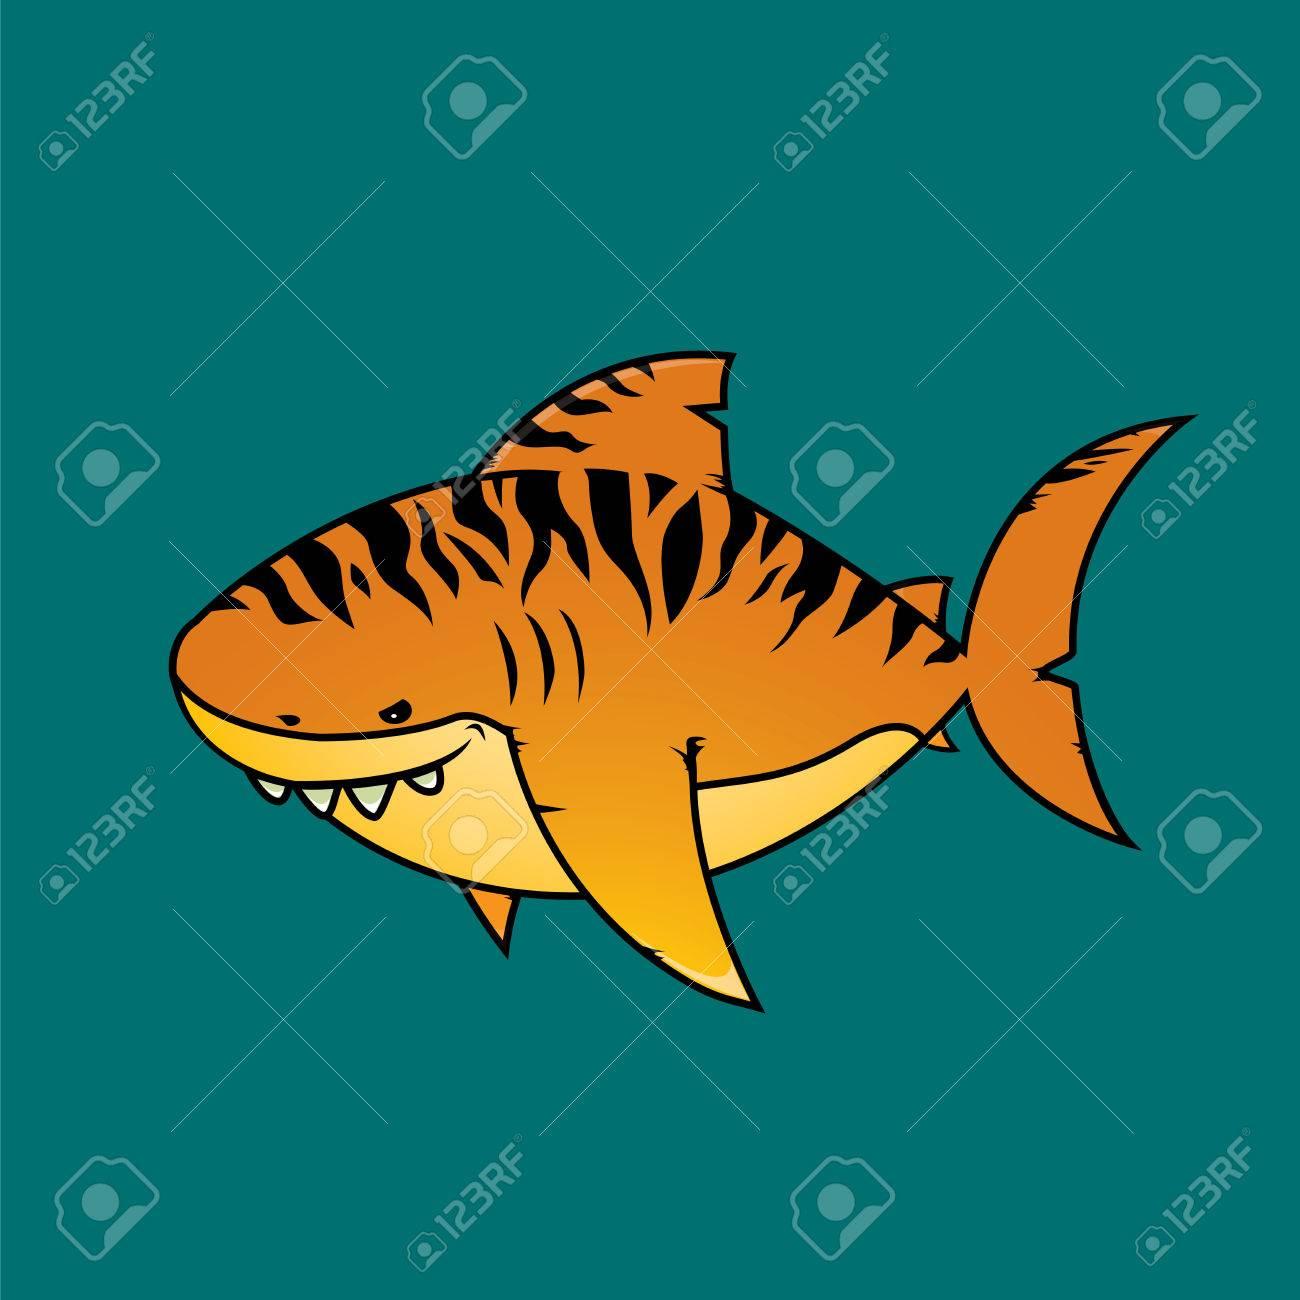 tiger shark isolated cartoon character royalty free cliparts rh 123rf com tiger shark cartoon tiger shark cartoon